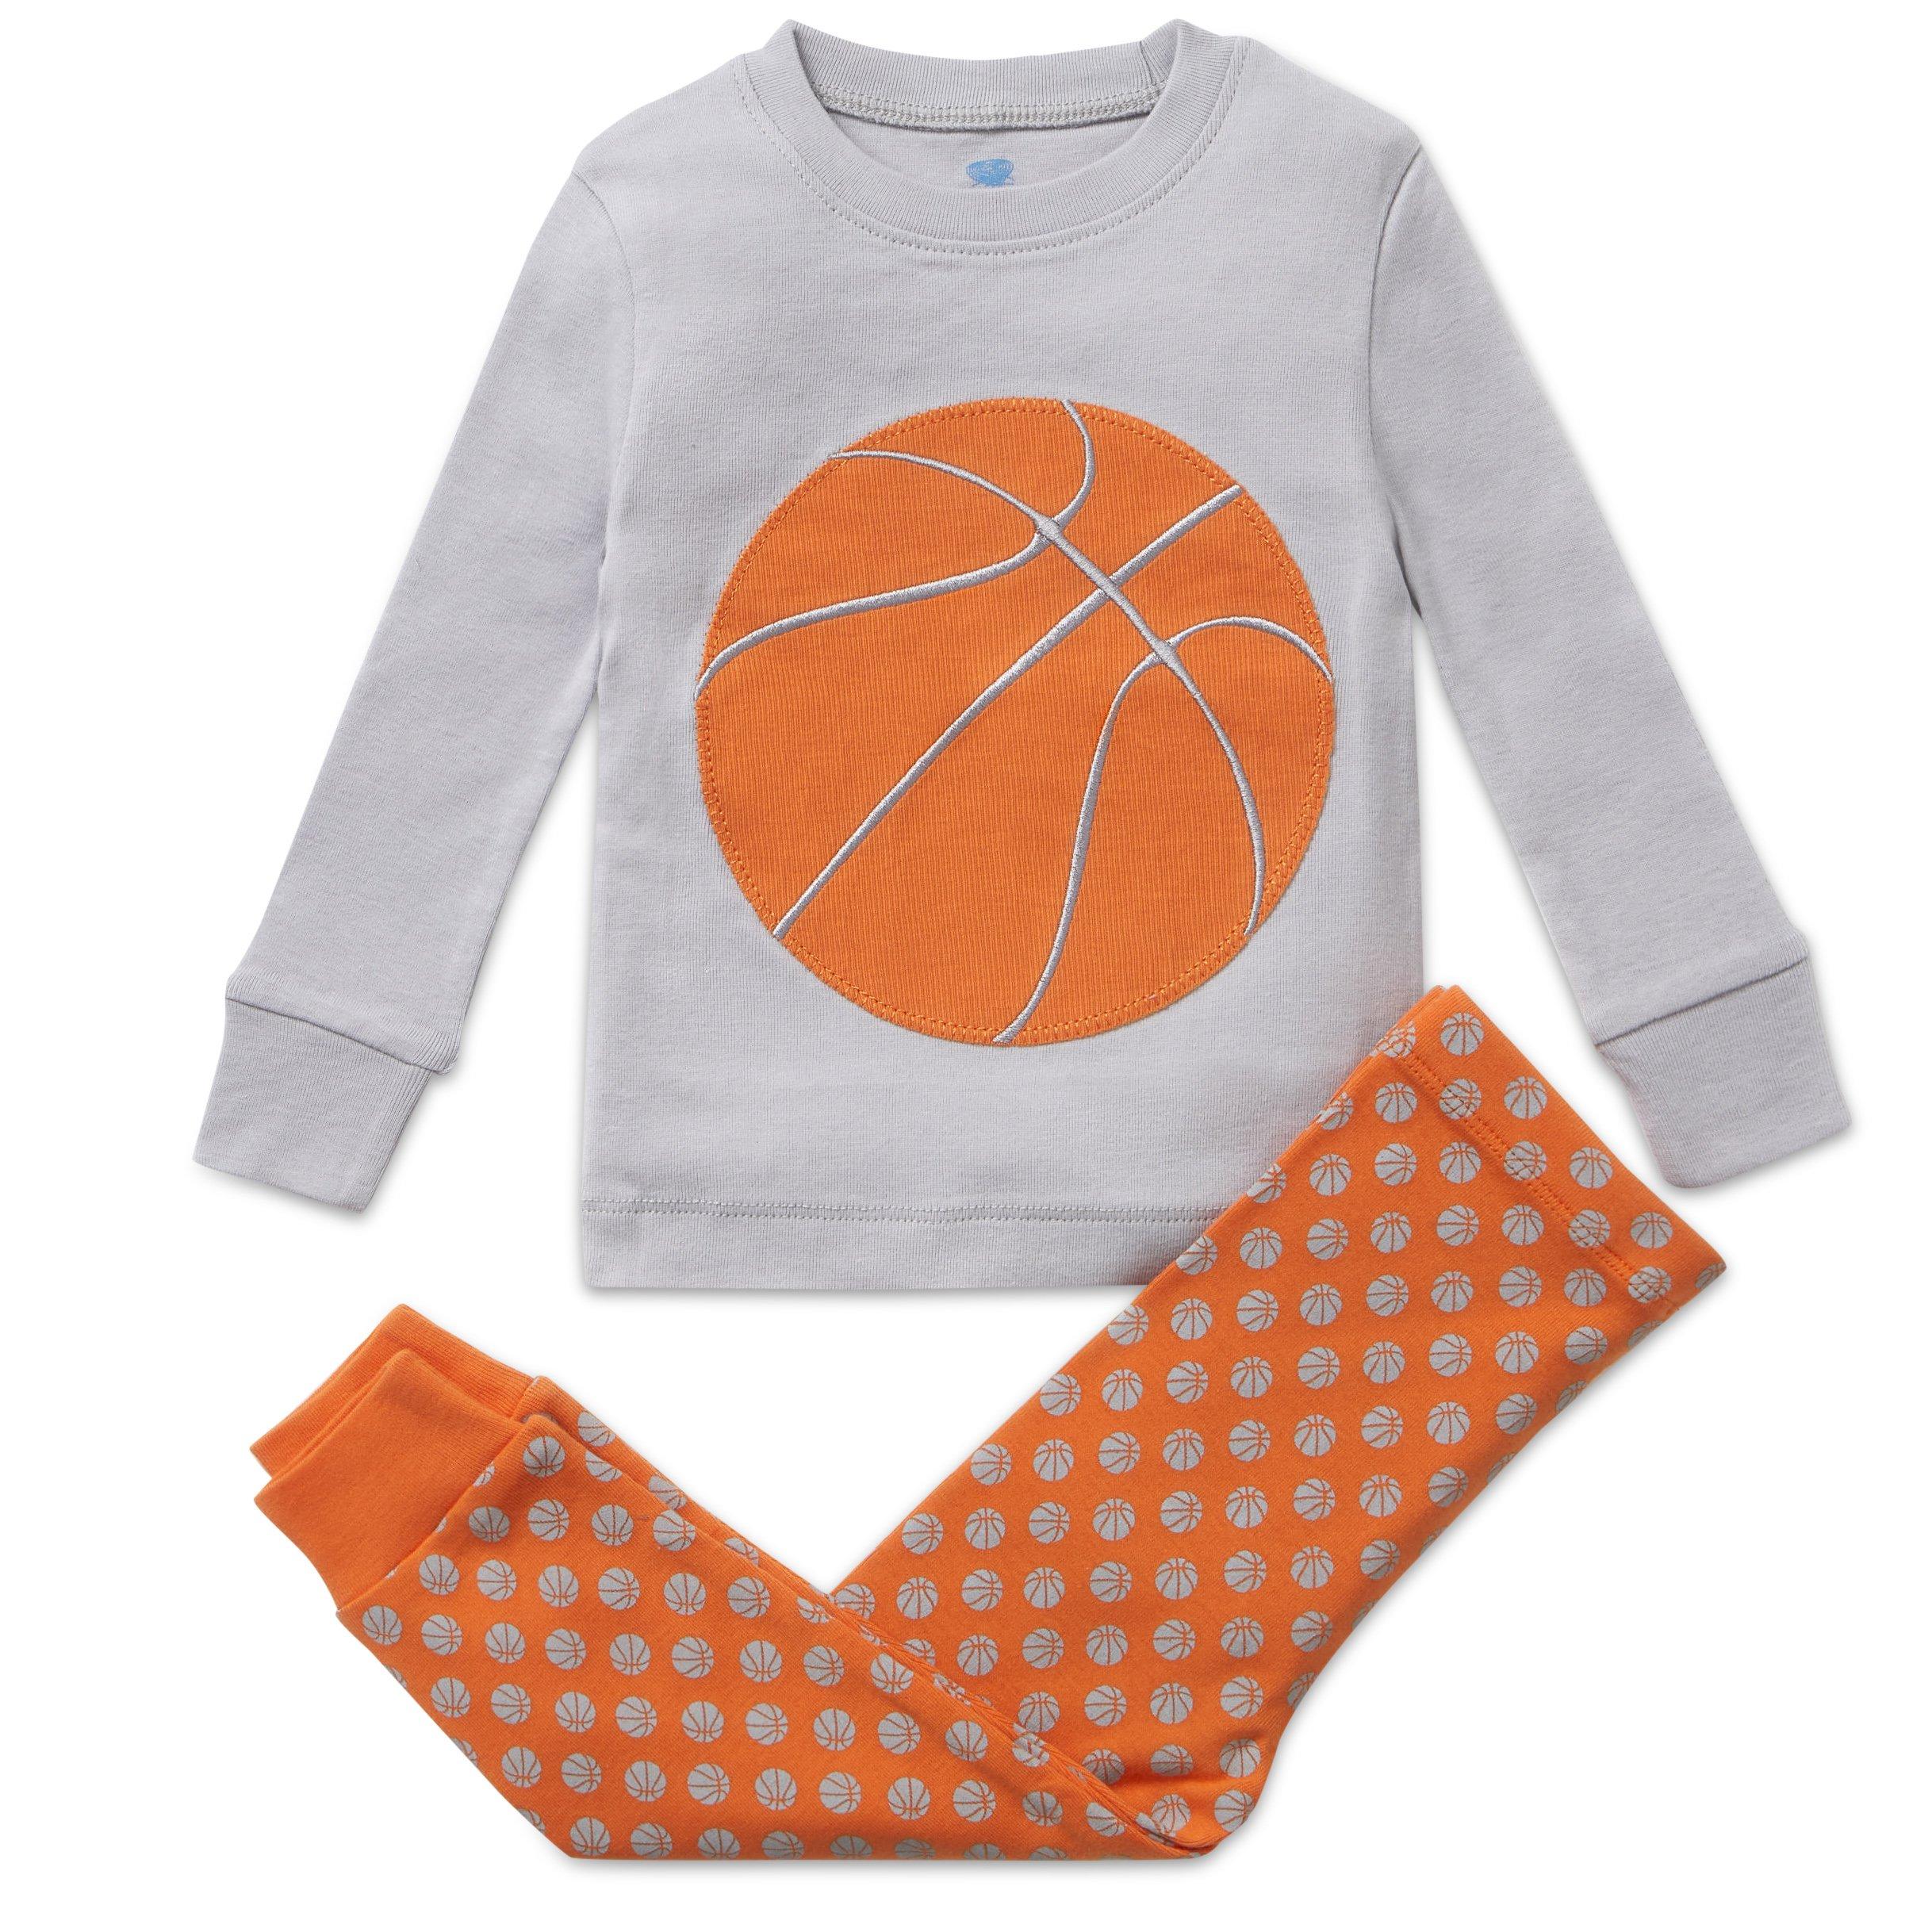 b55395ad8 Best Rated in Boys  Sleepwear   Helpful Customer Reviews - Amazon.com